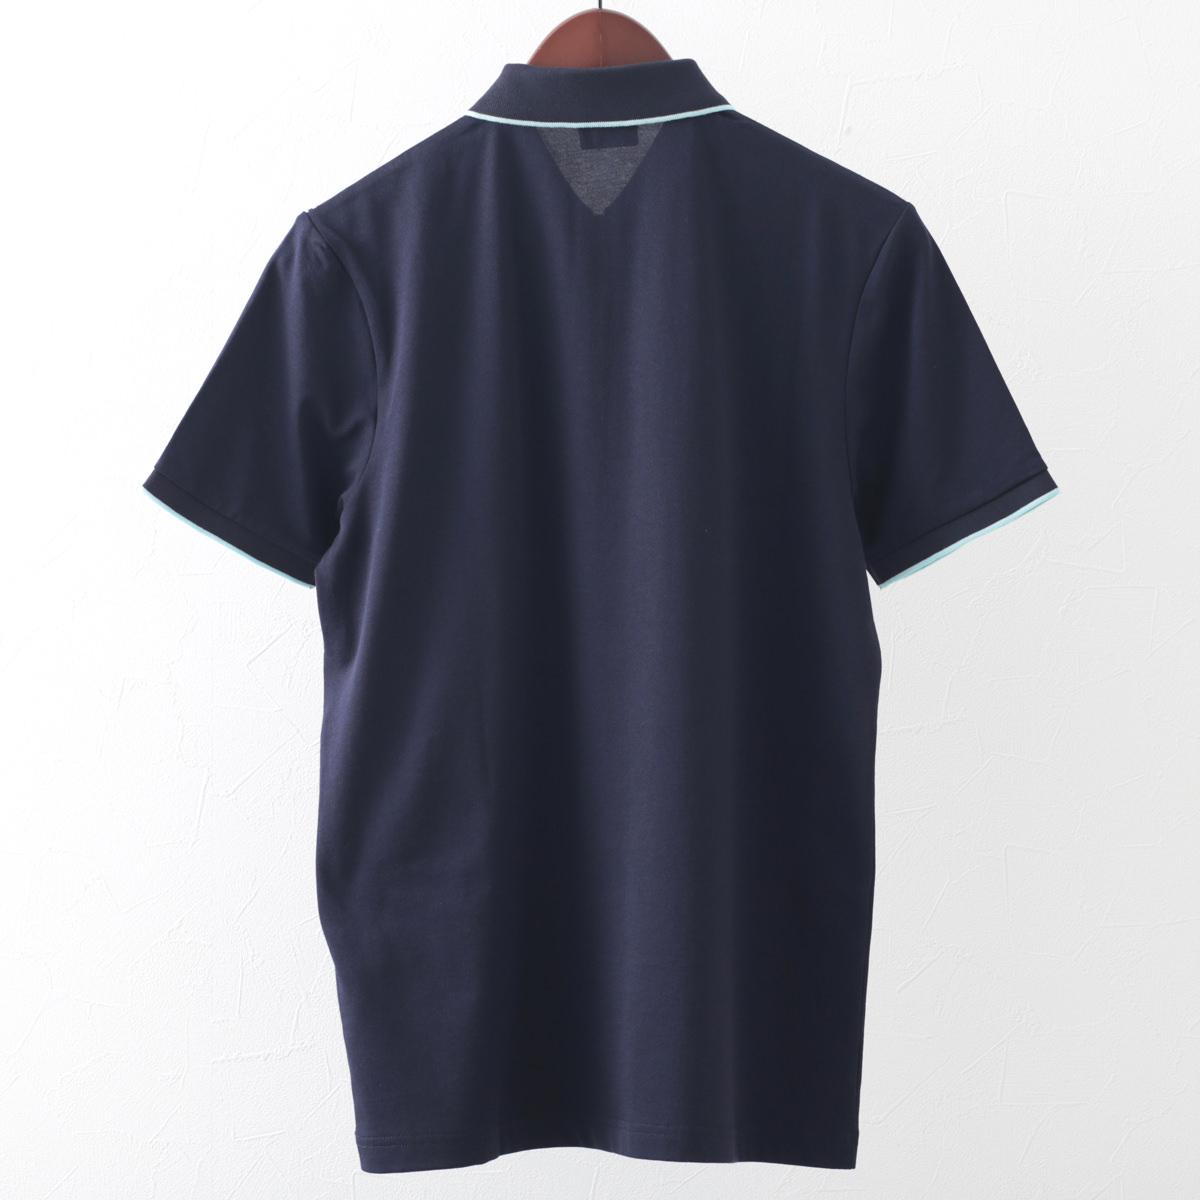 Gabicci メンズ ポロシャツ ポロ ストライプ ジップ ガビッチ 2色 ネイビー ヘイ レトロ モッズファッション